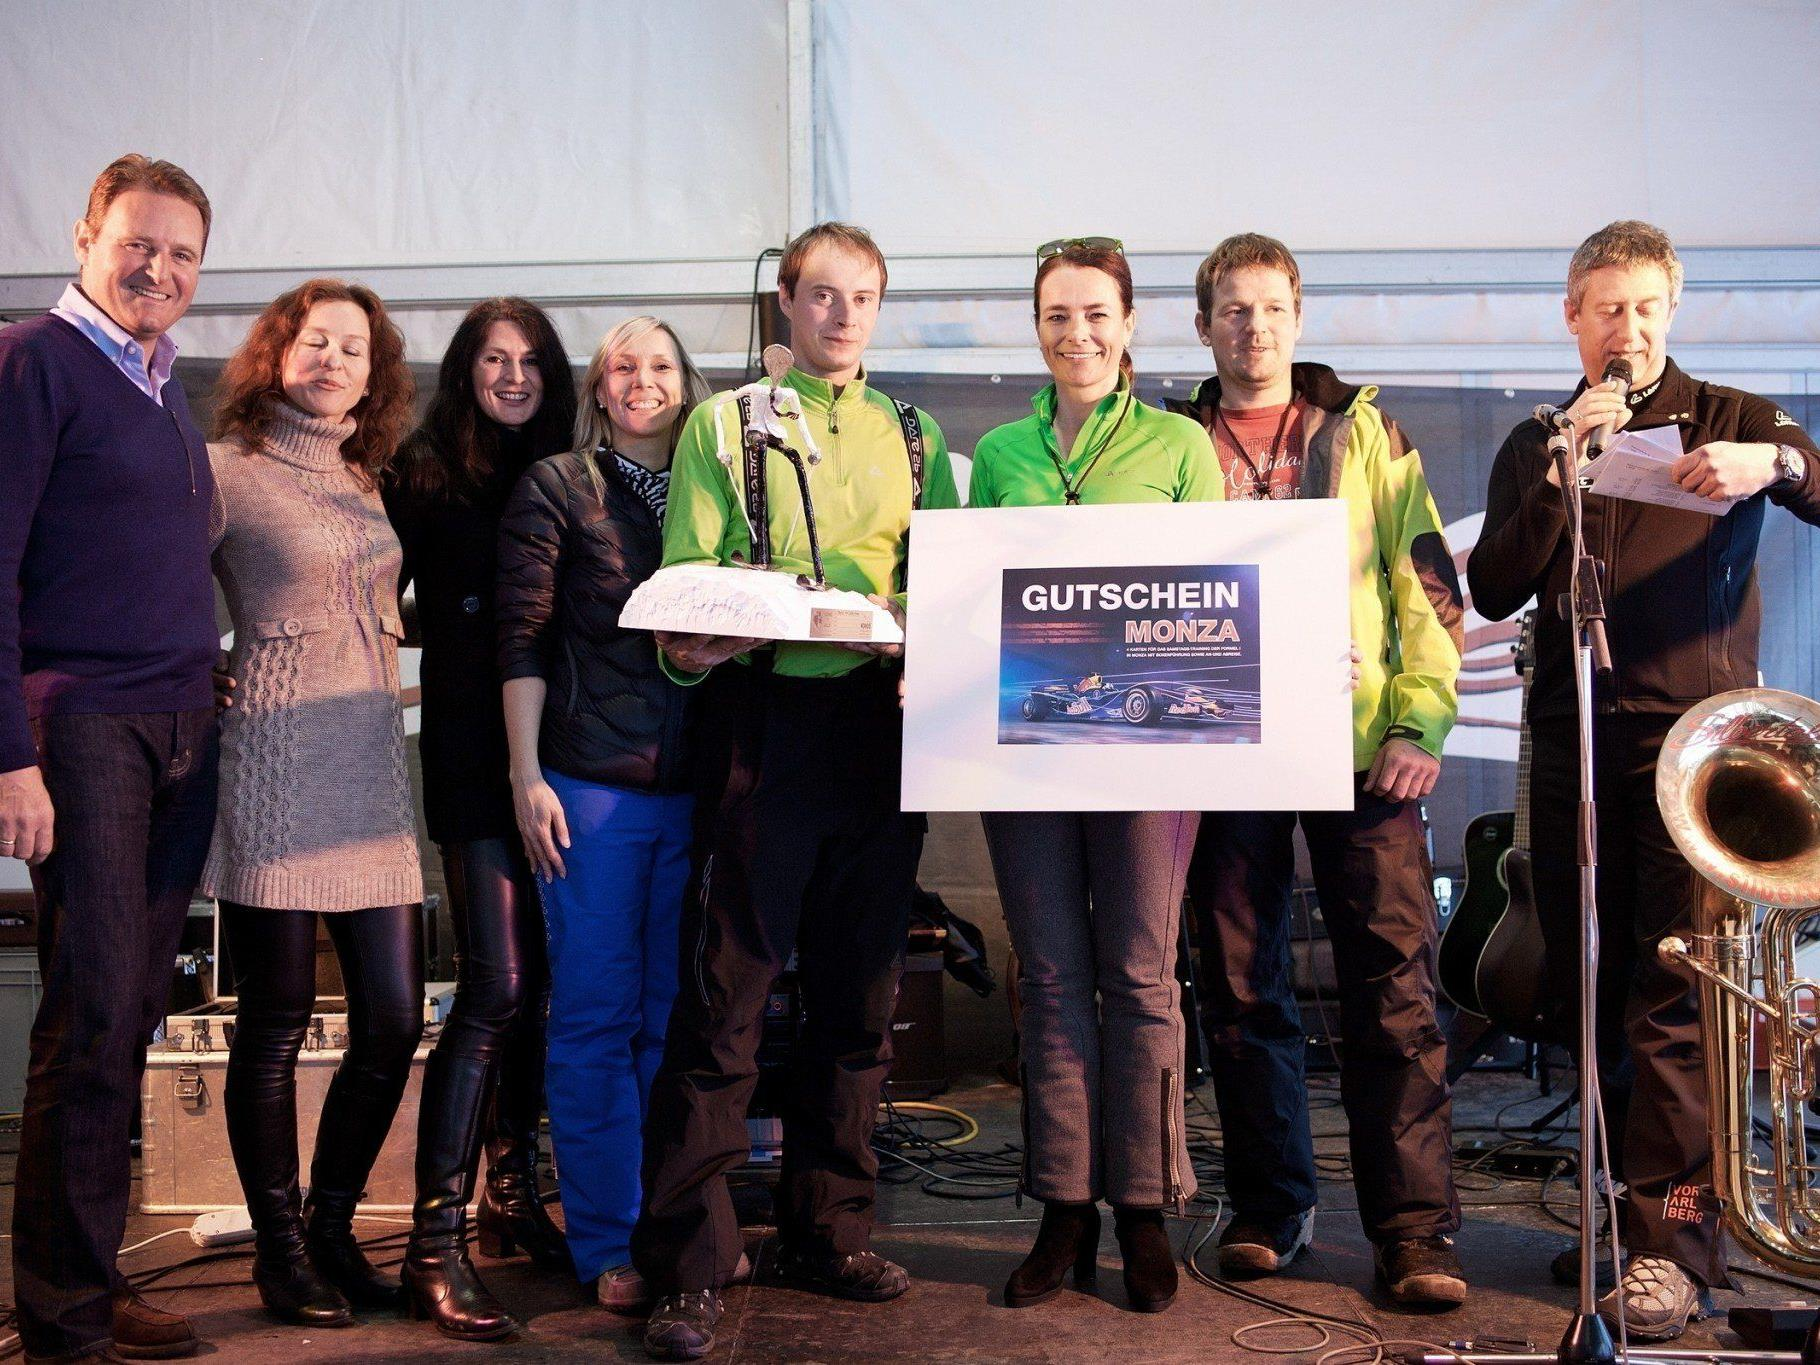 Sieger Durchschnittswertung Holzbau Fetz mit Waltraud Fetz, Michael Fetz, Stefan Greber, Peter Meusburger;